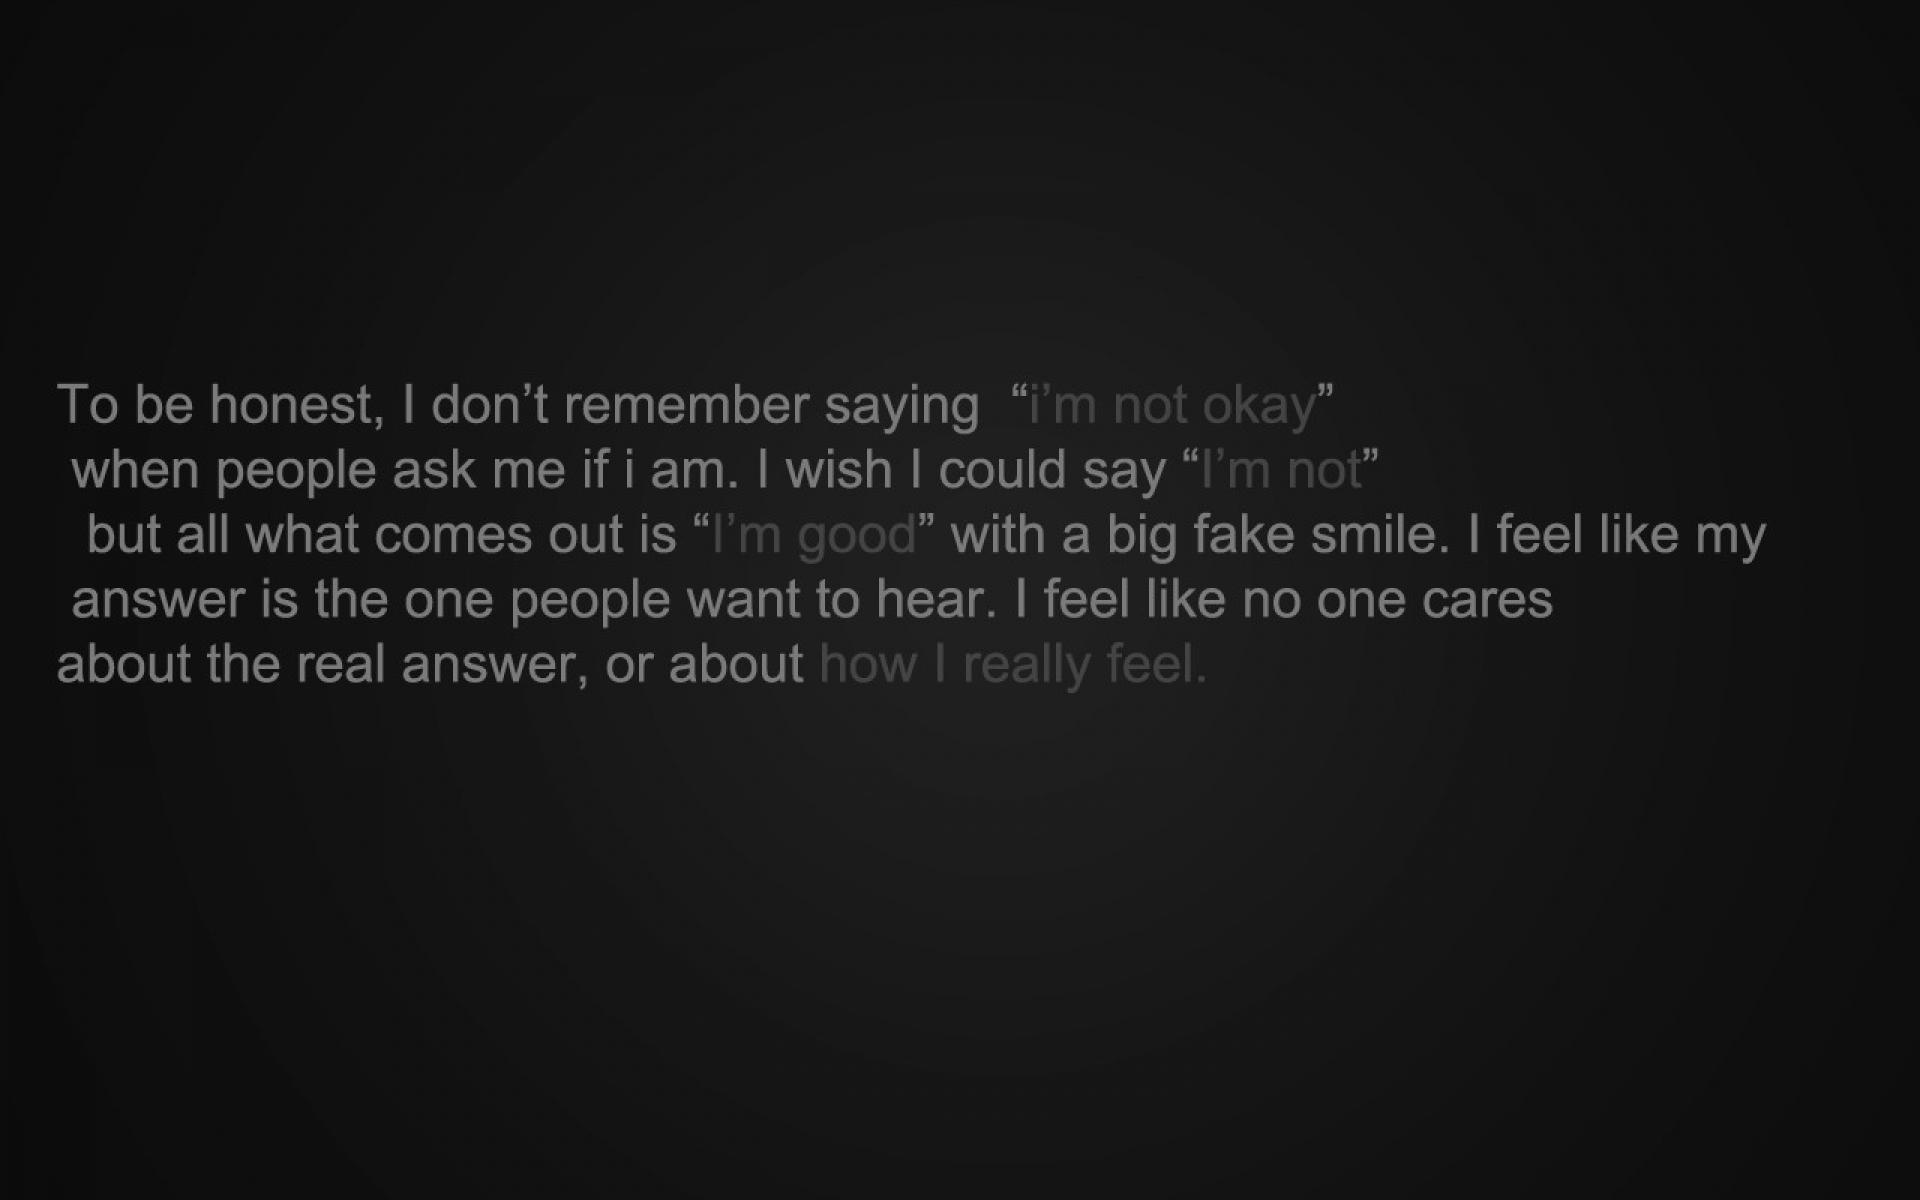 Quotes sad darkness depressing sadness depression ezechyel wallpaper 1920x1200